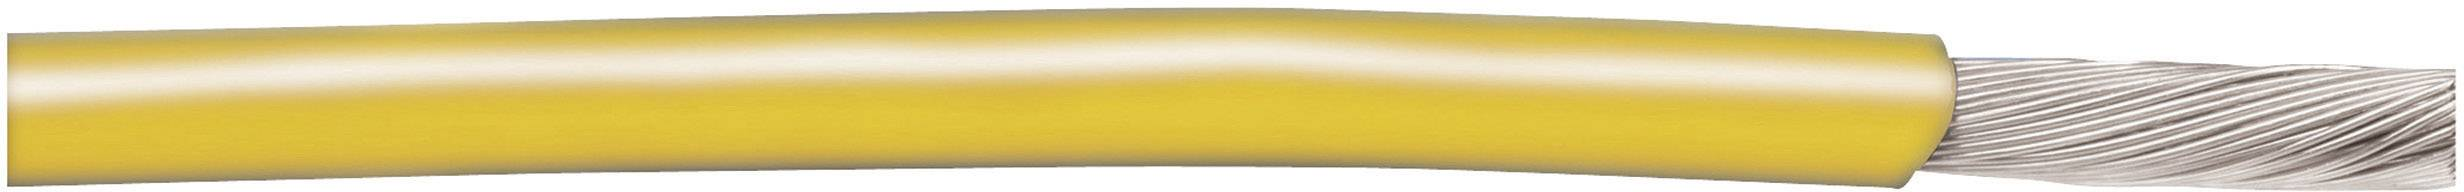 Pletenica 1 x 1.31 mm, rumena AlphaWire 3077 YL001 cena za meter